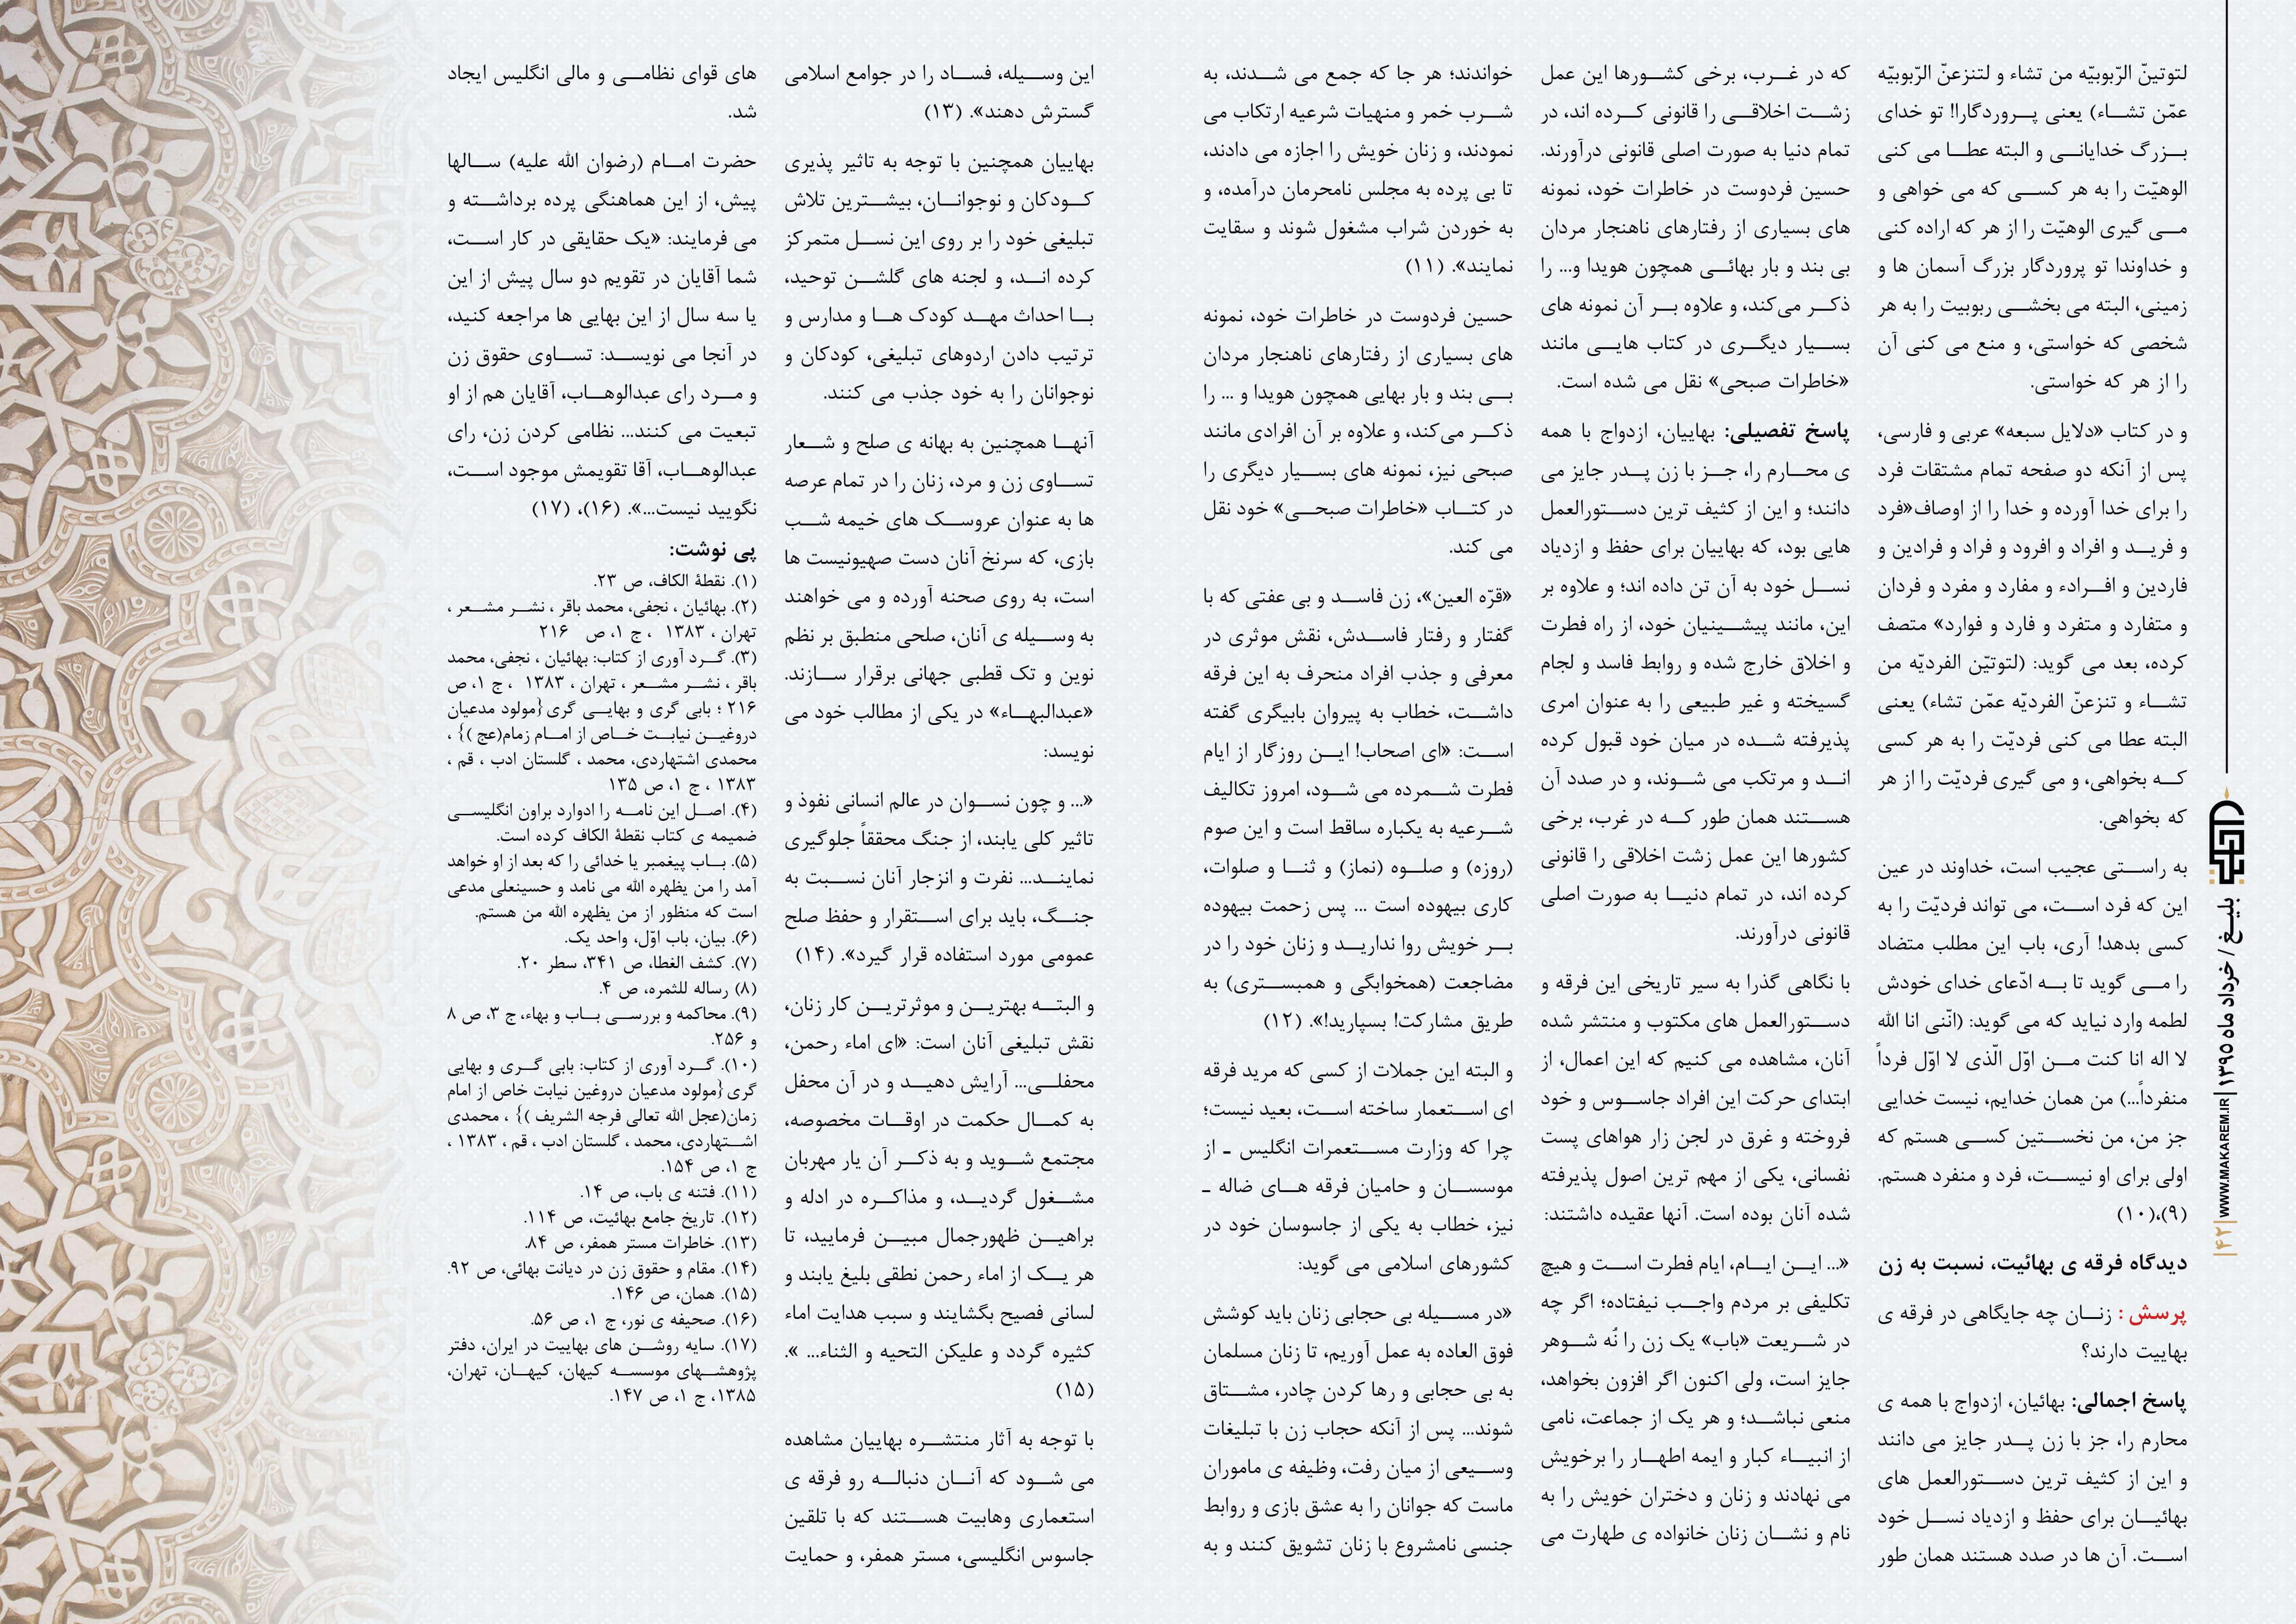 بلیغ 22-مدرسه الامام امیر المومنین (ع)